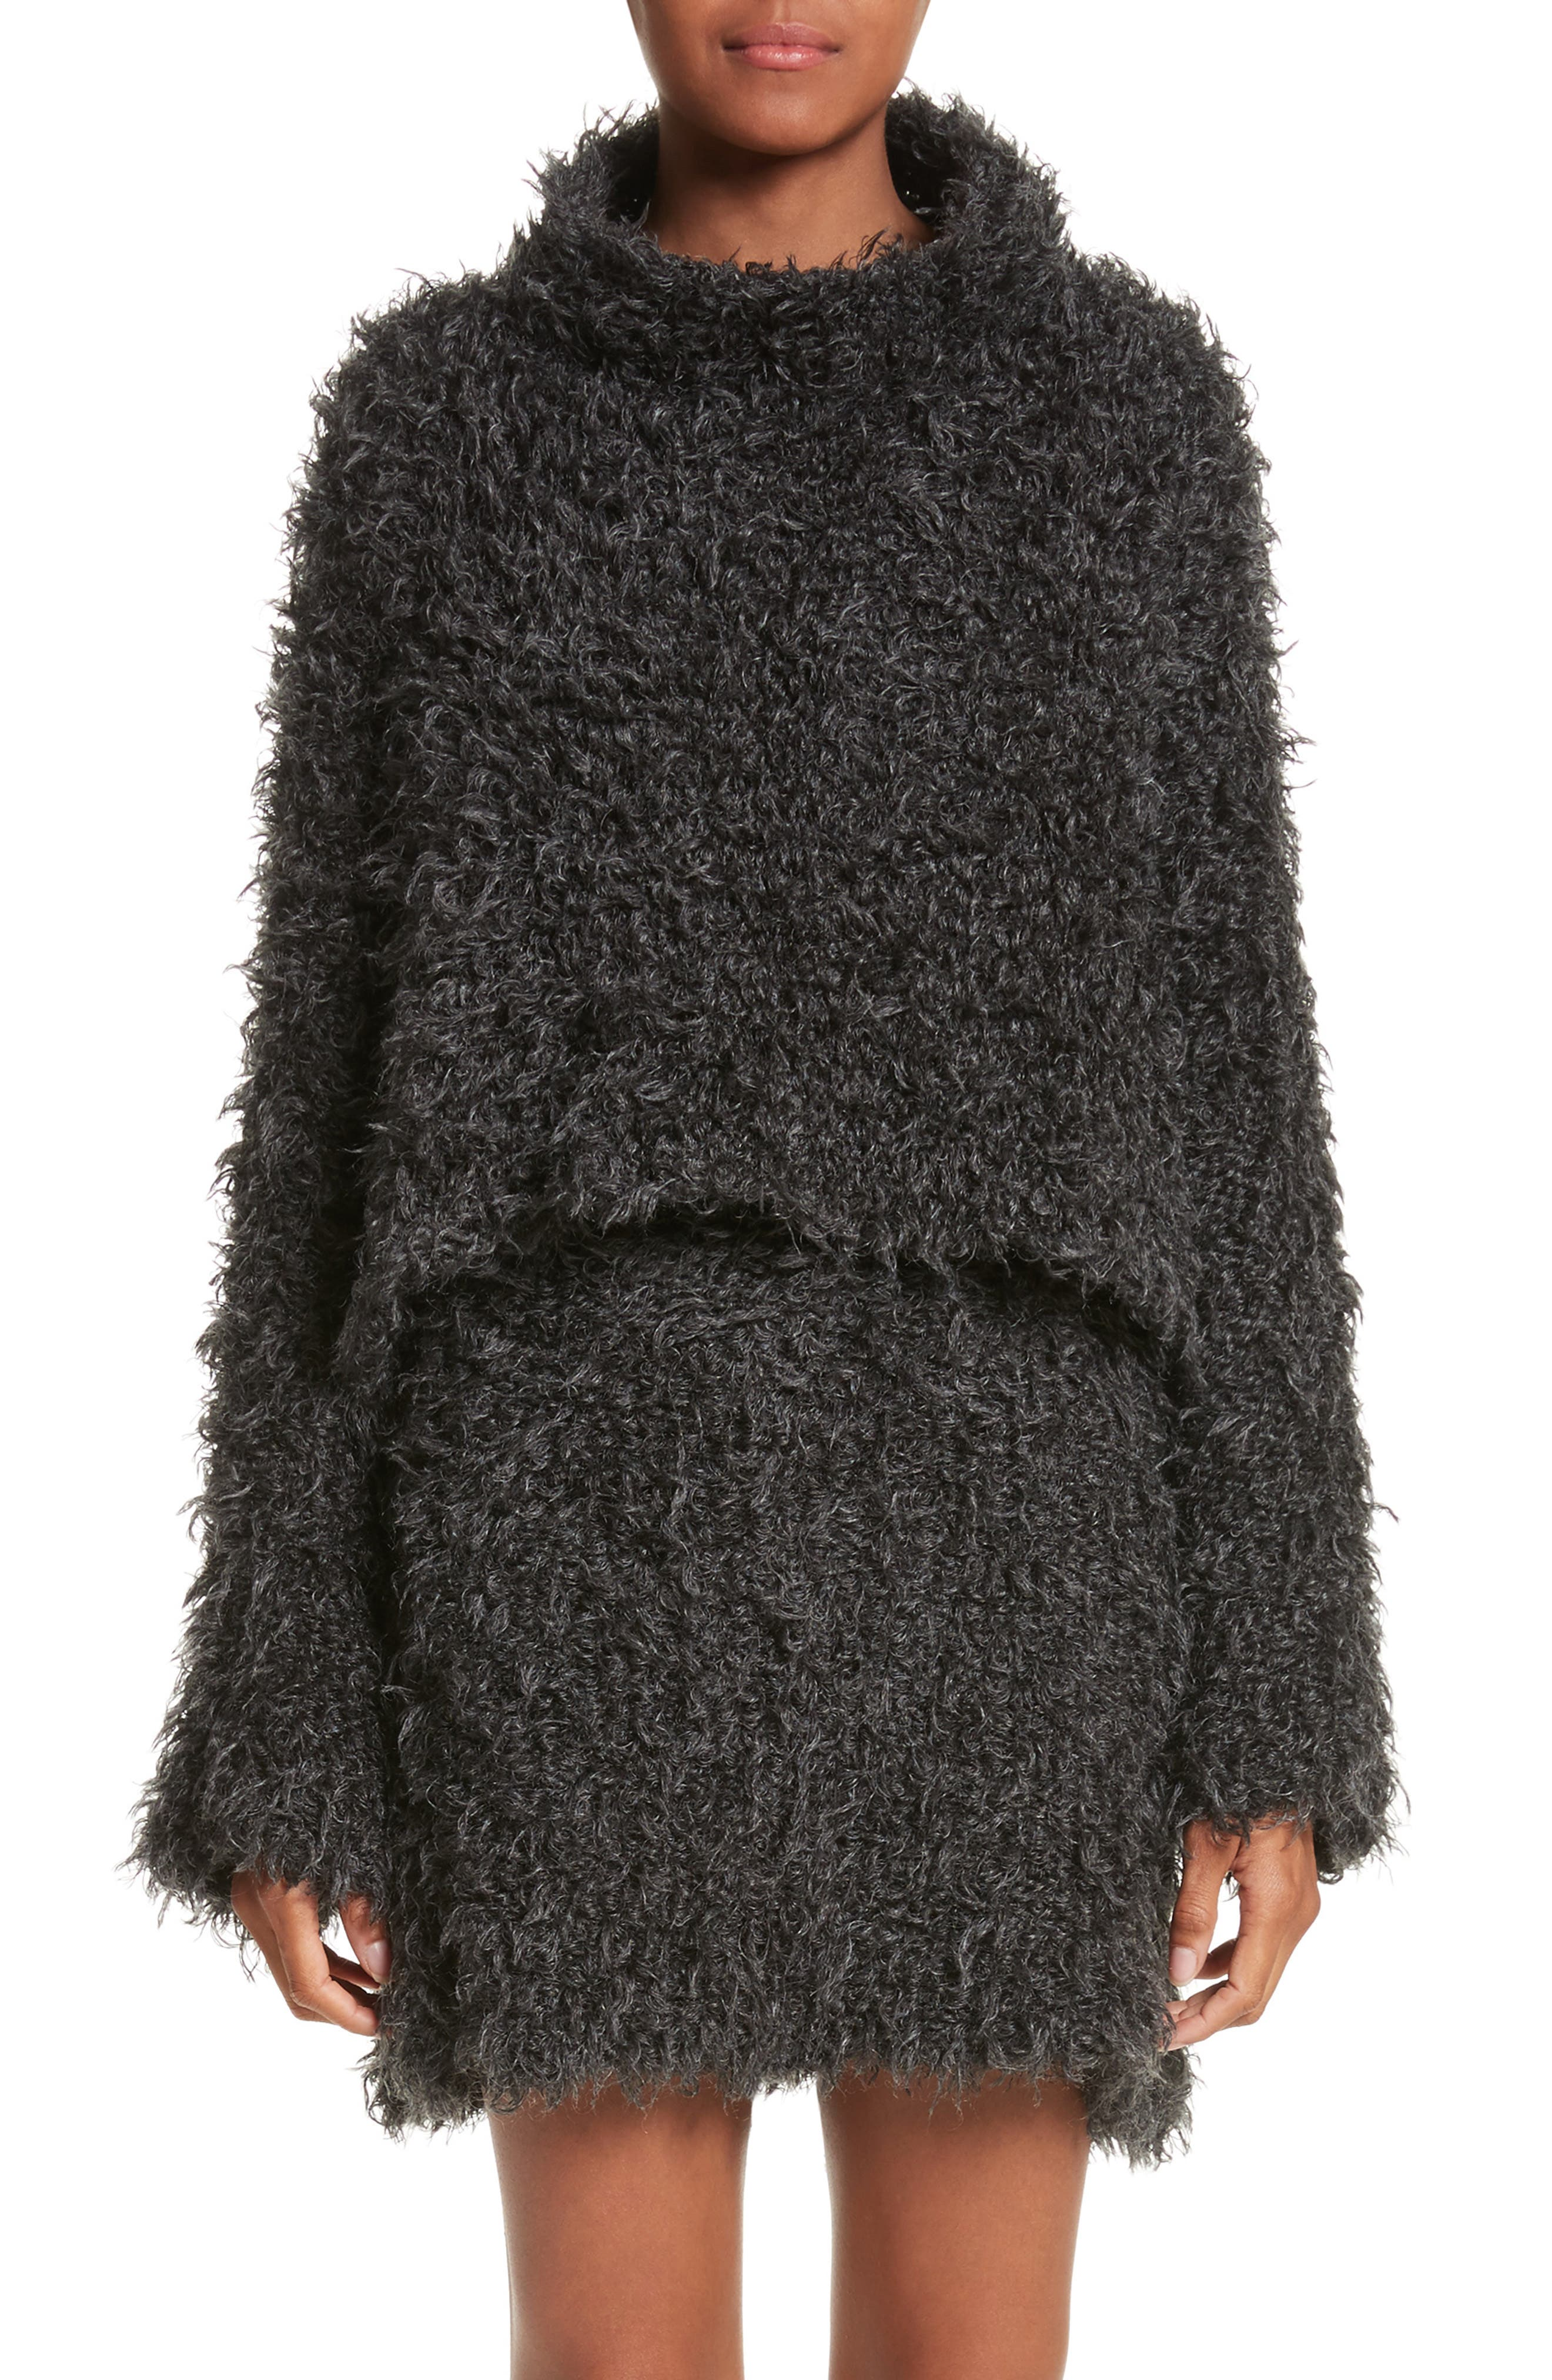 Eckhaus Latta Fuzzy Dolman Sweater